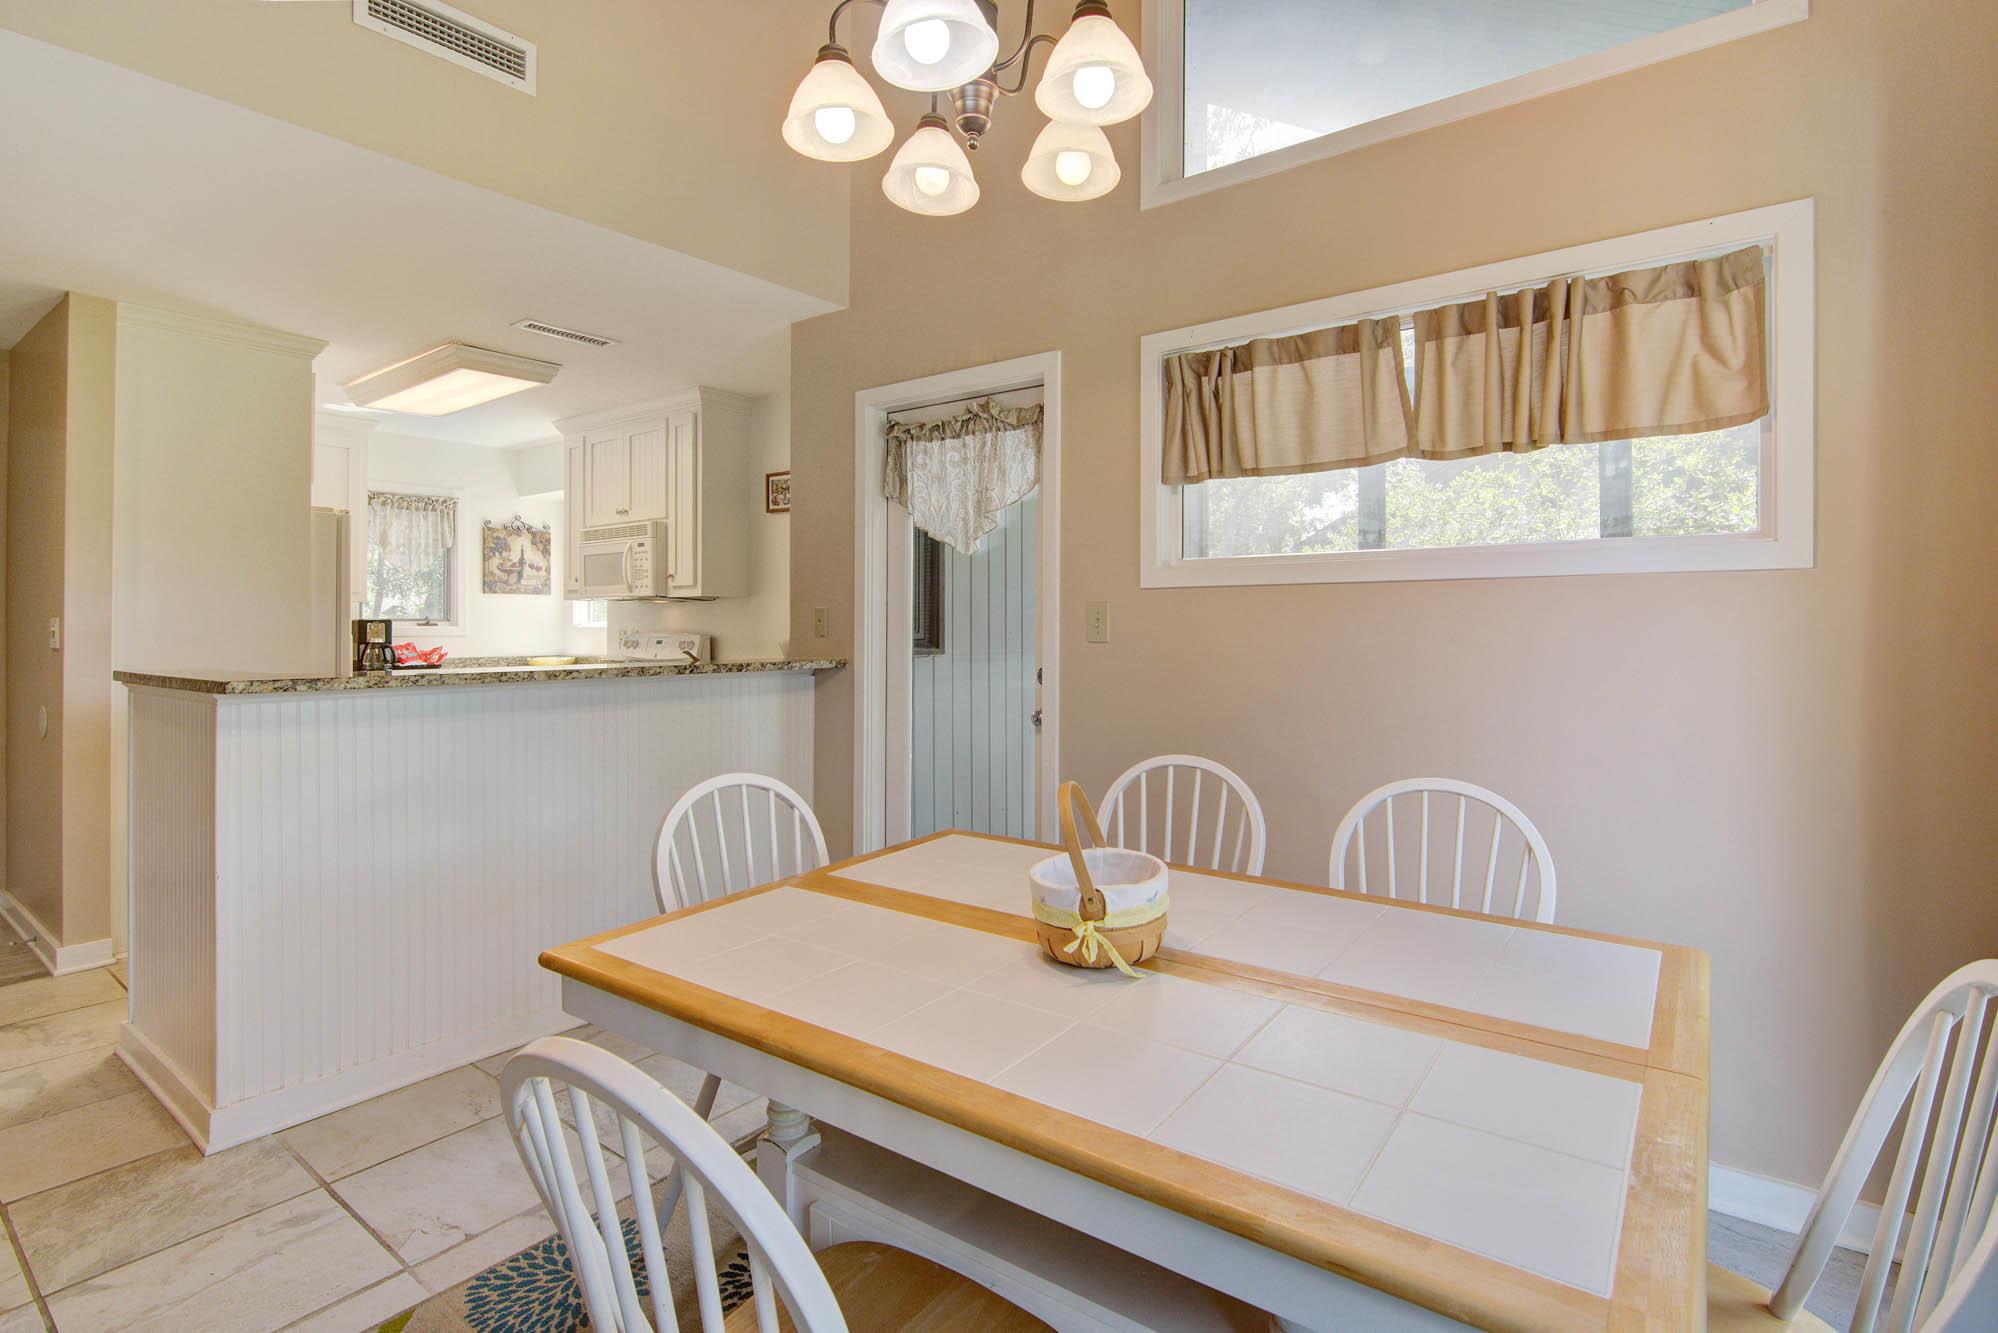 Kiawah Island Homes For Sale - 4504 Park Lake, Kiawah Island, SC - 14